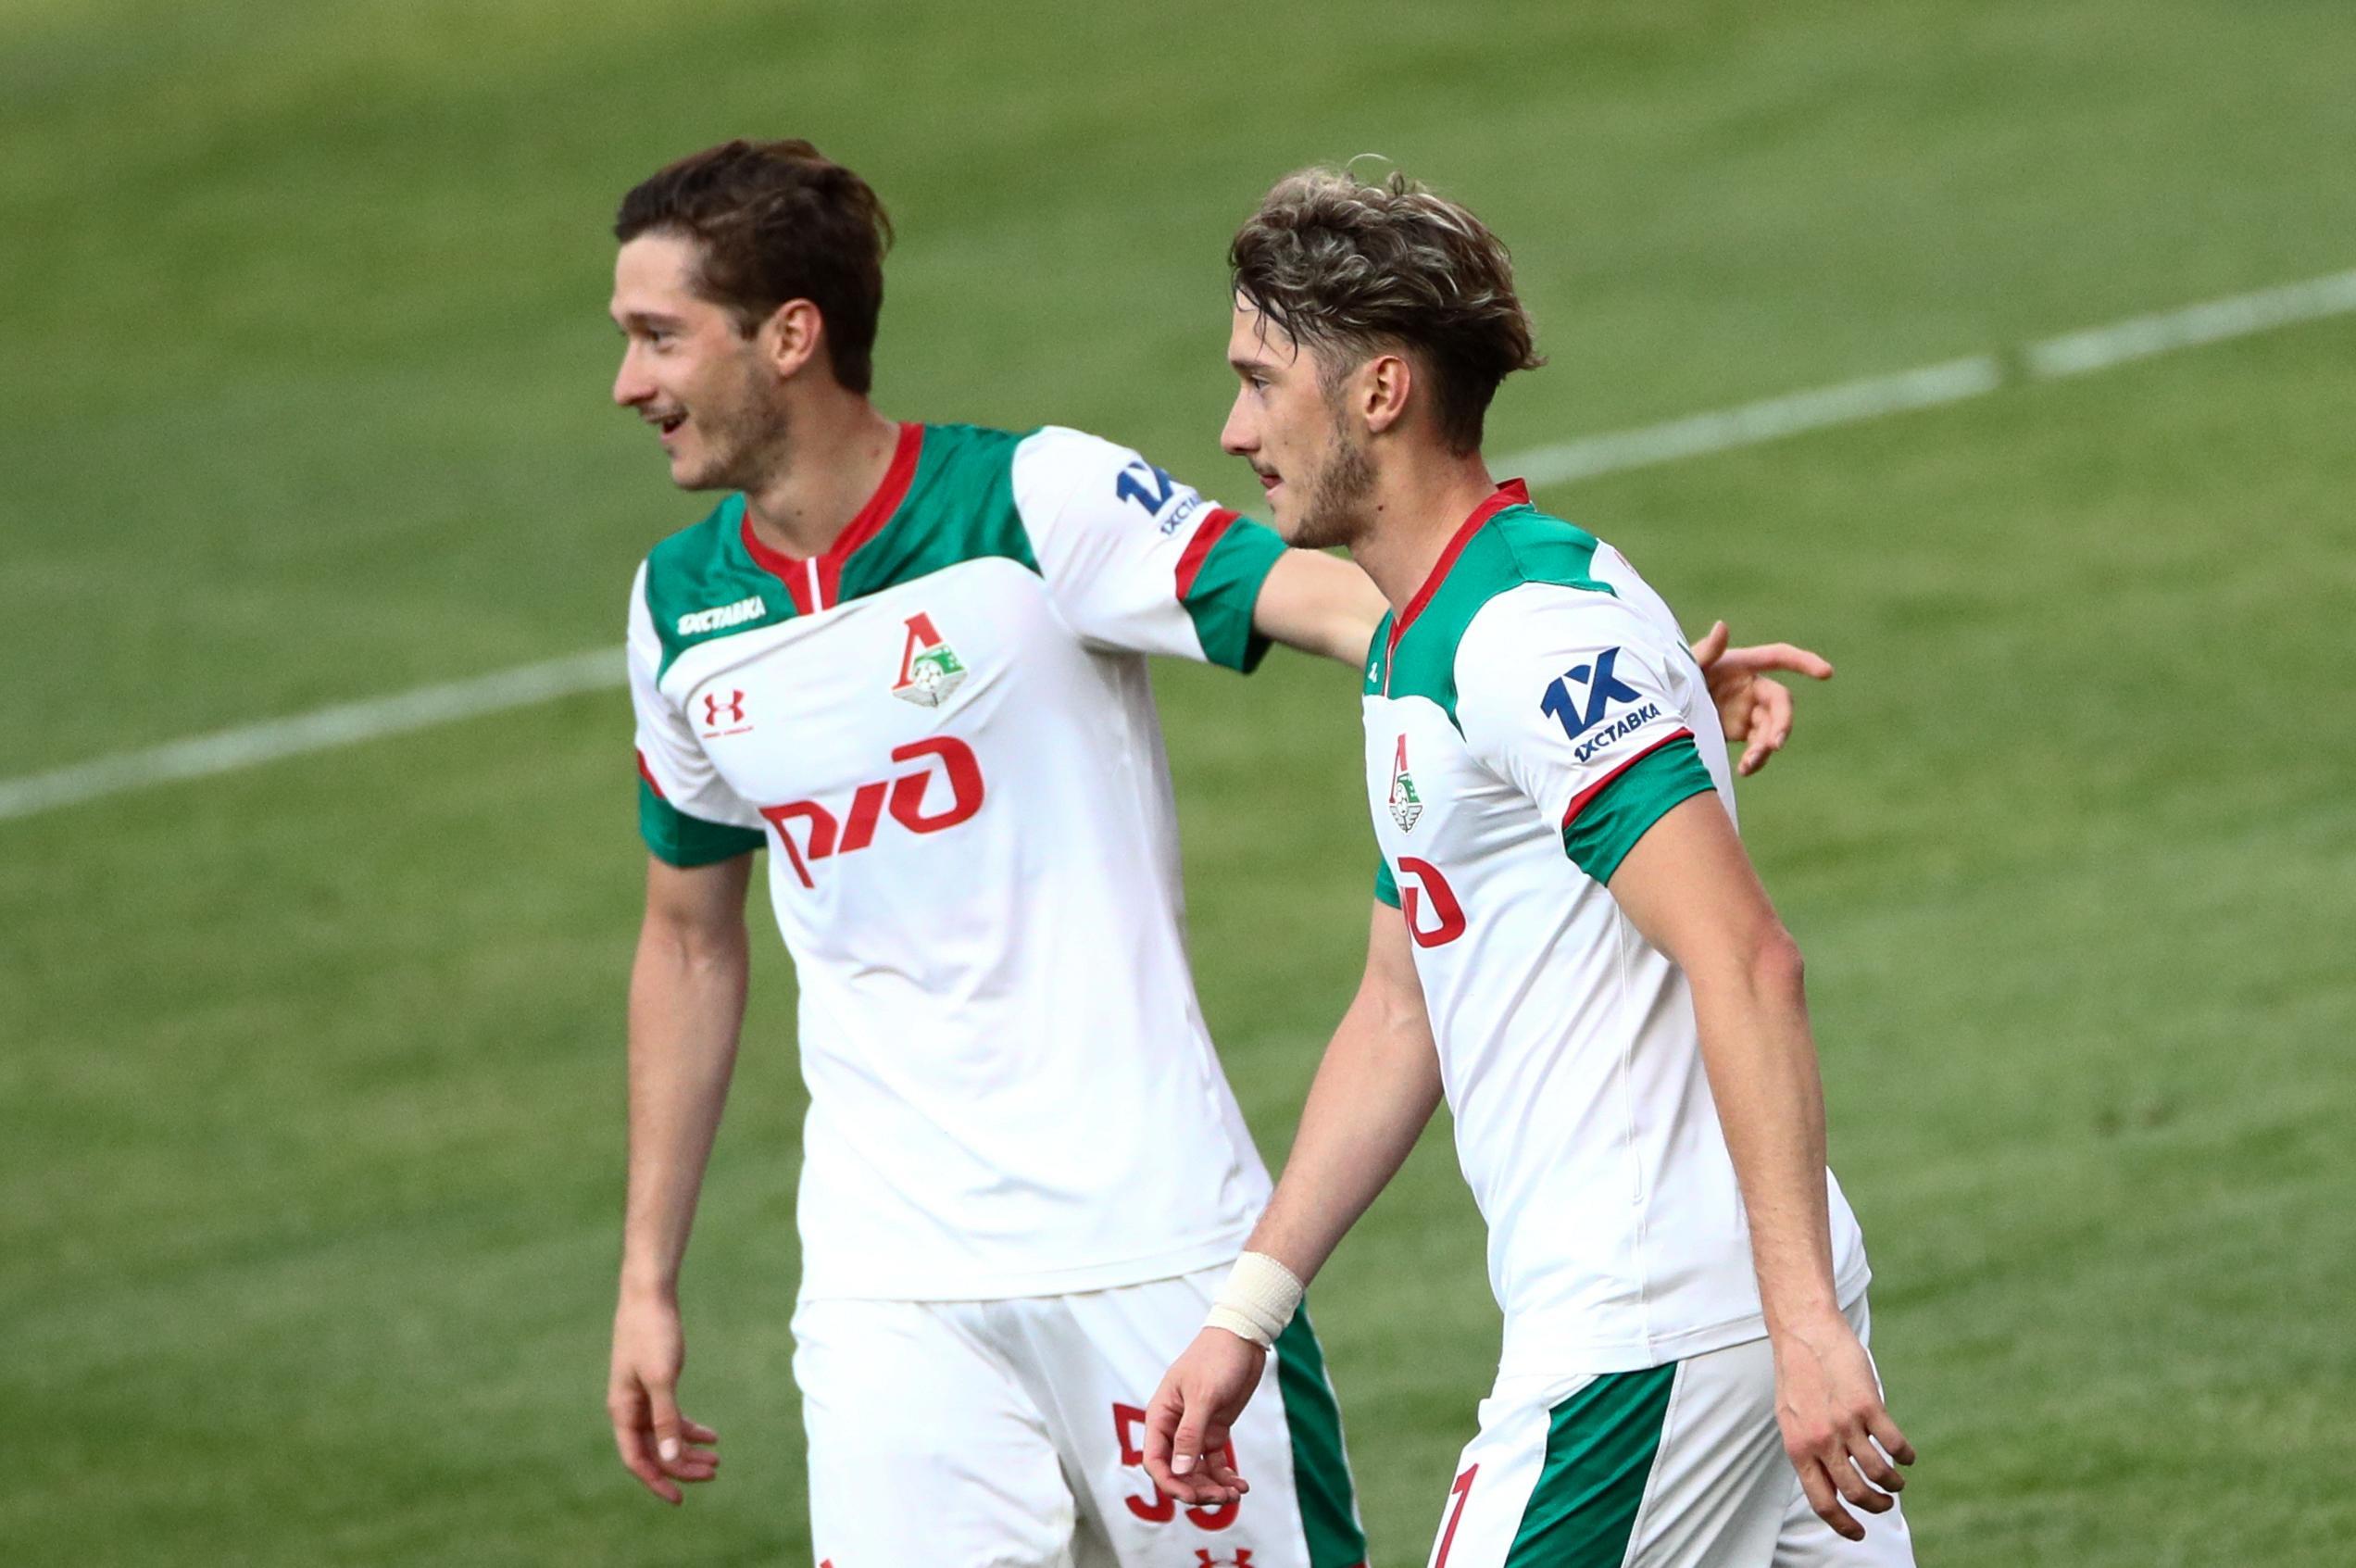 Фото © Sport-Express / TASS / Дарья Исаева